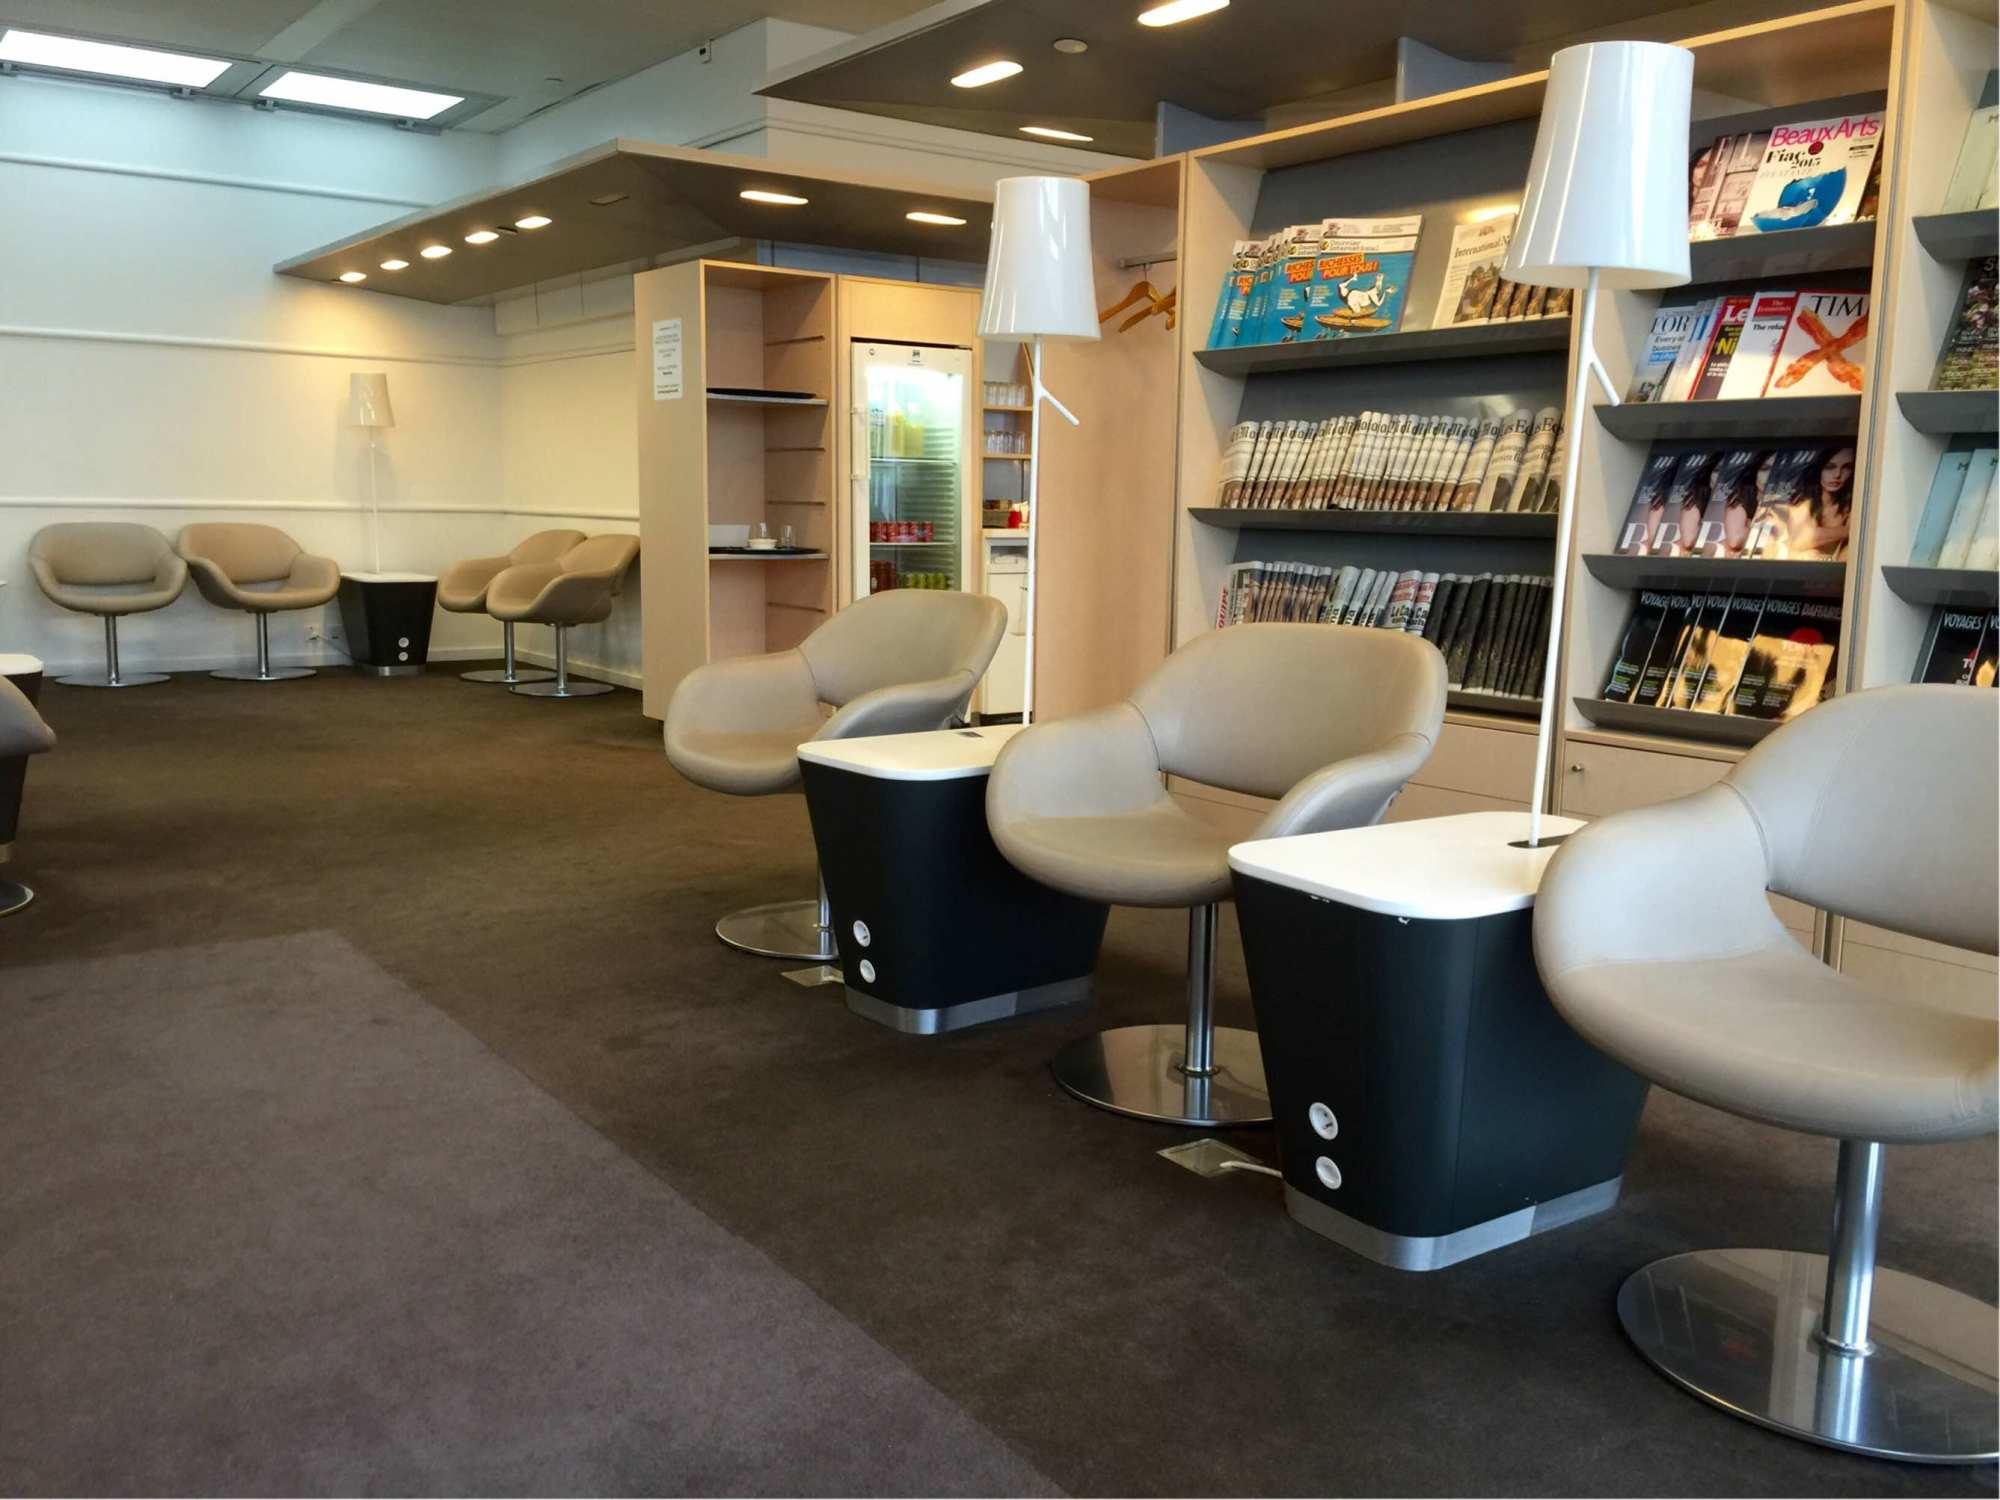 Air France Lounge Access